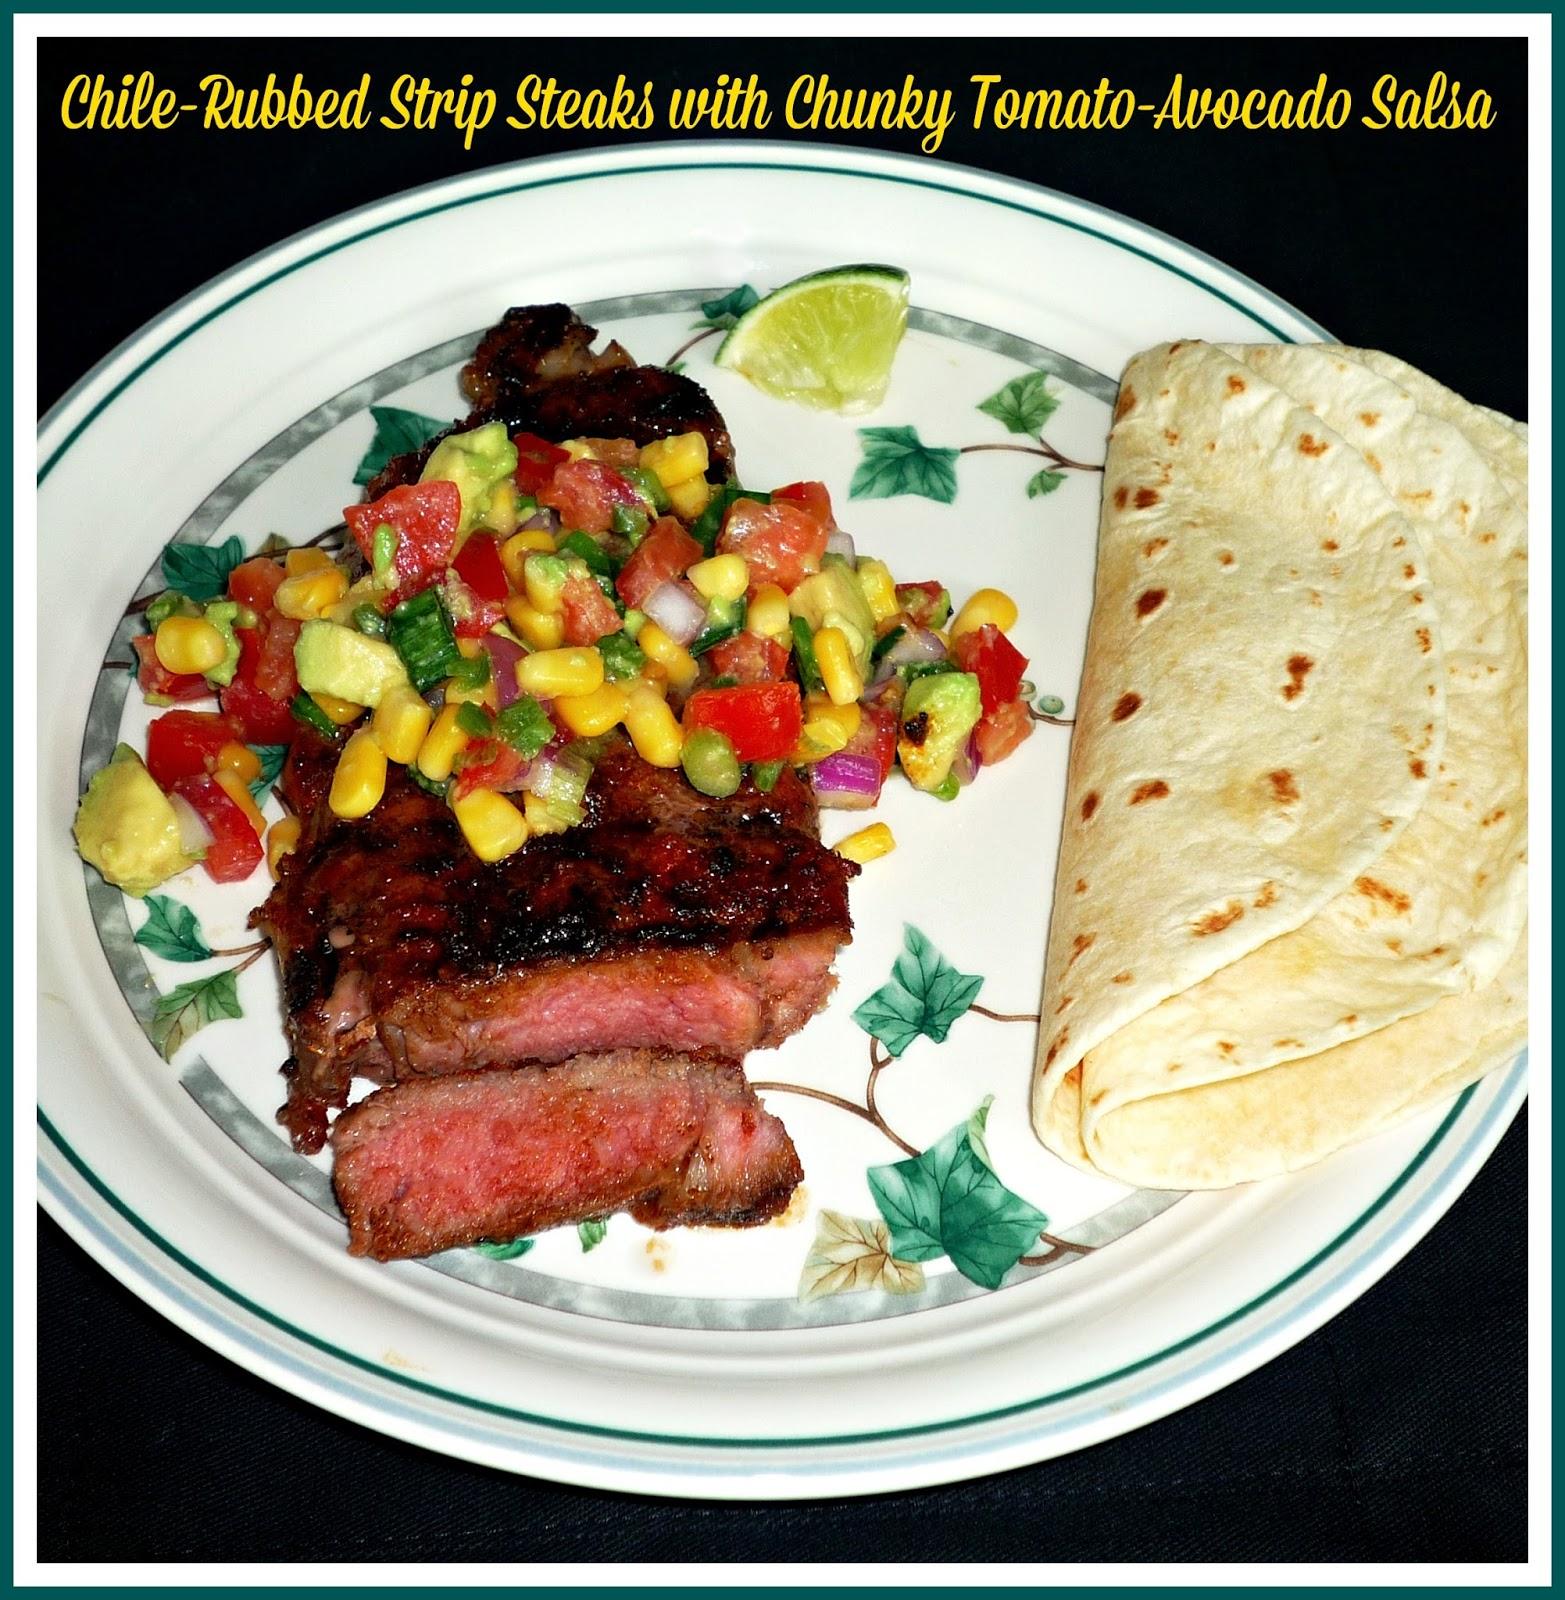 ... Chile-Rubbed Strip Steaks with Chunky Tomato-Avocado Salsa #GrillTalk